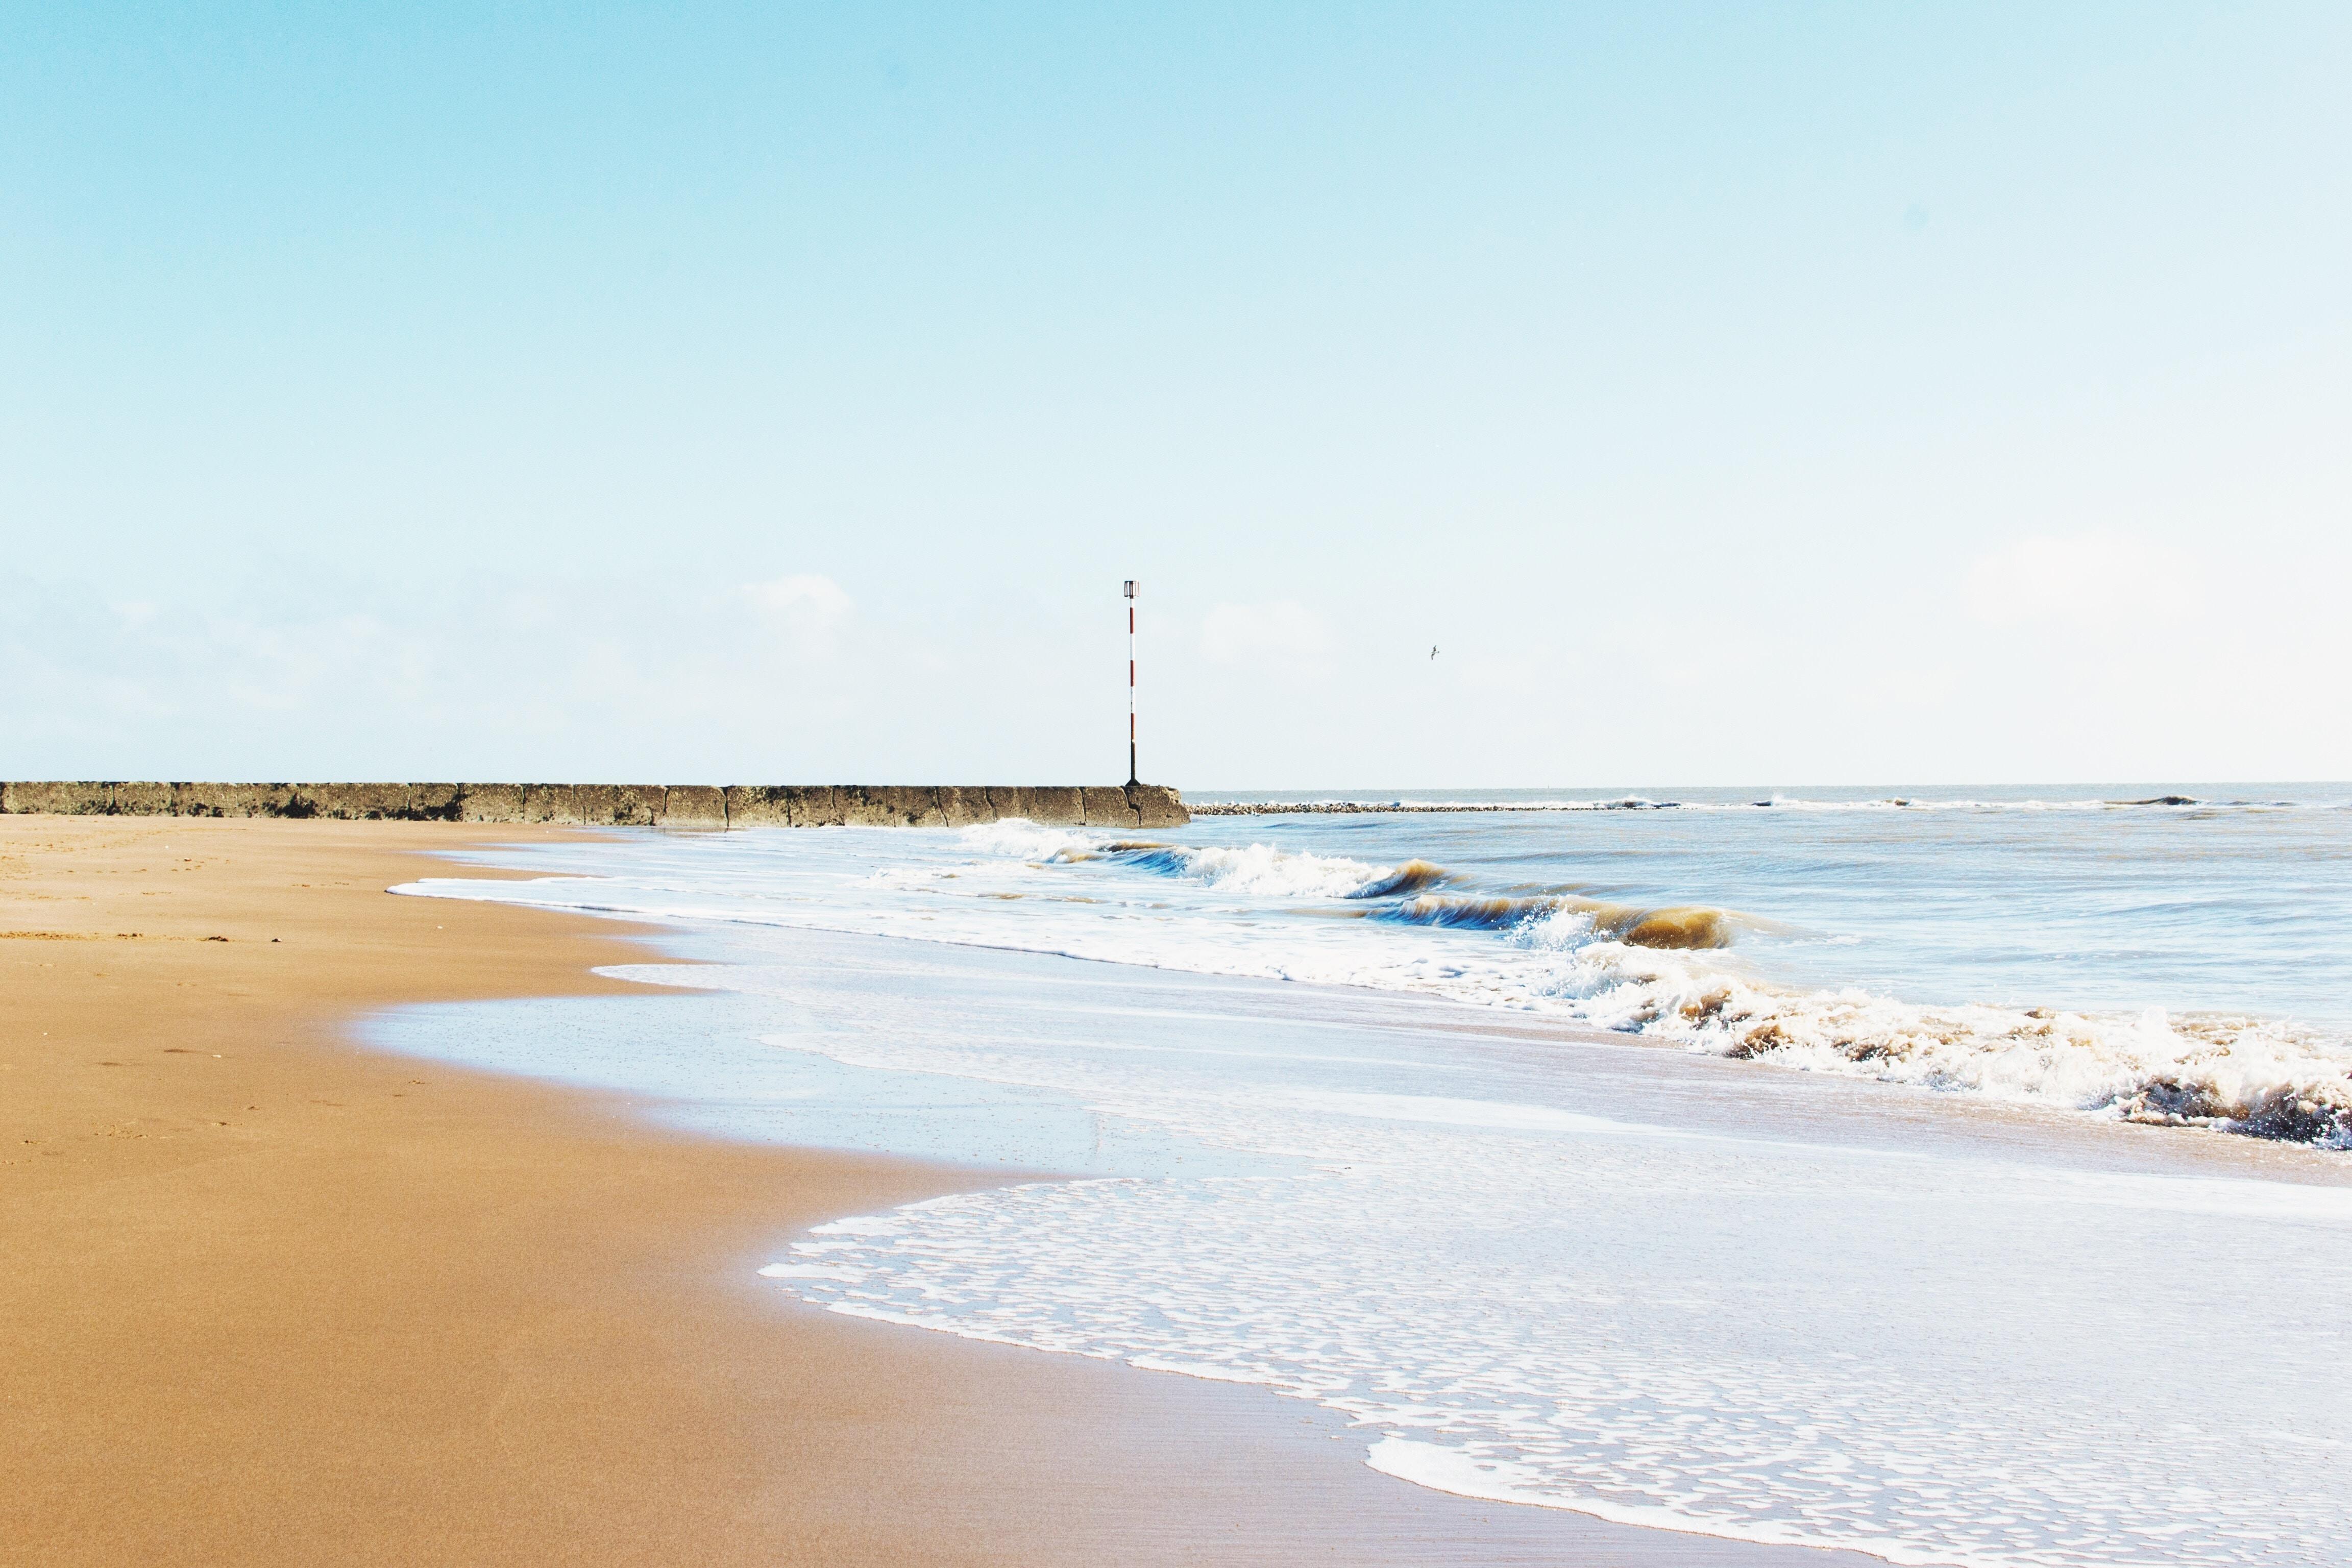 Ocean washing on the fine sand beach at Ramsgate